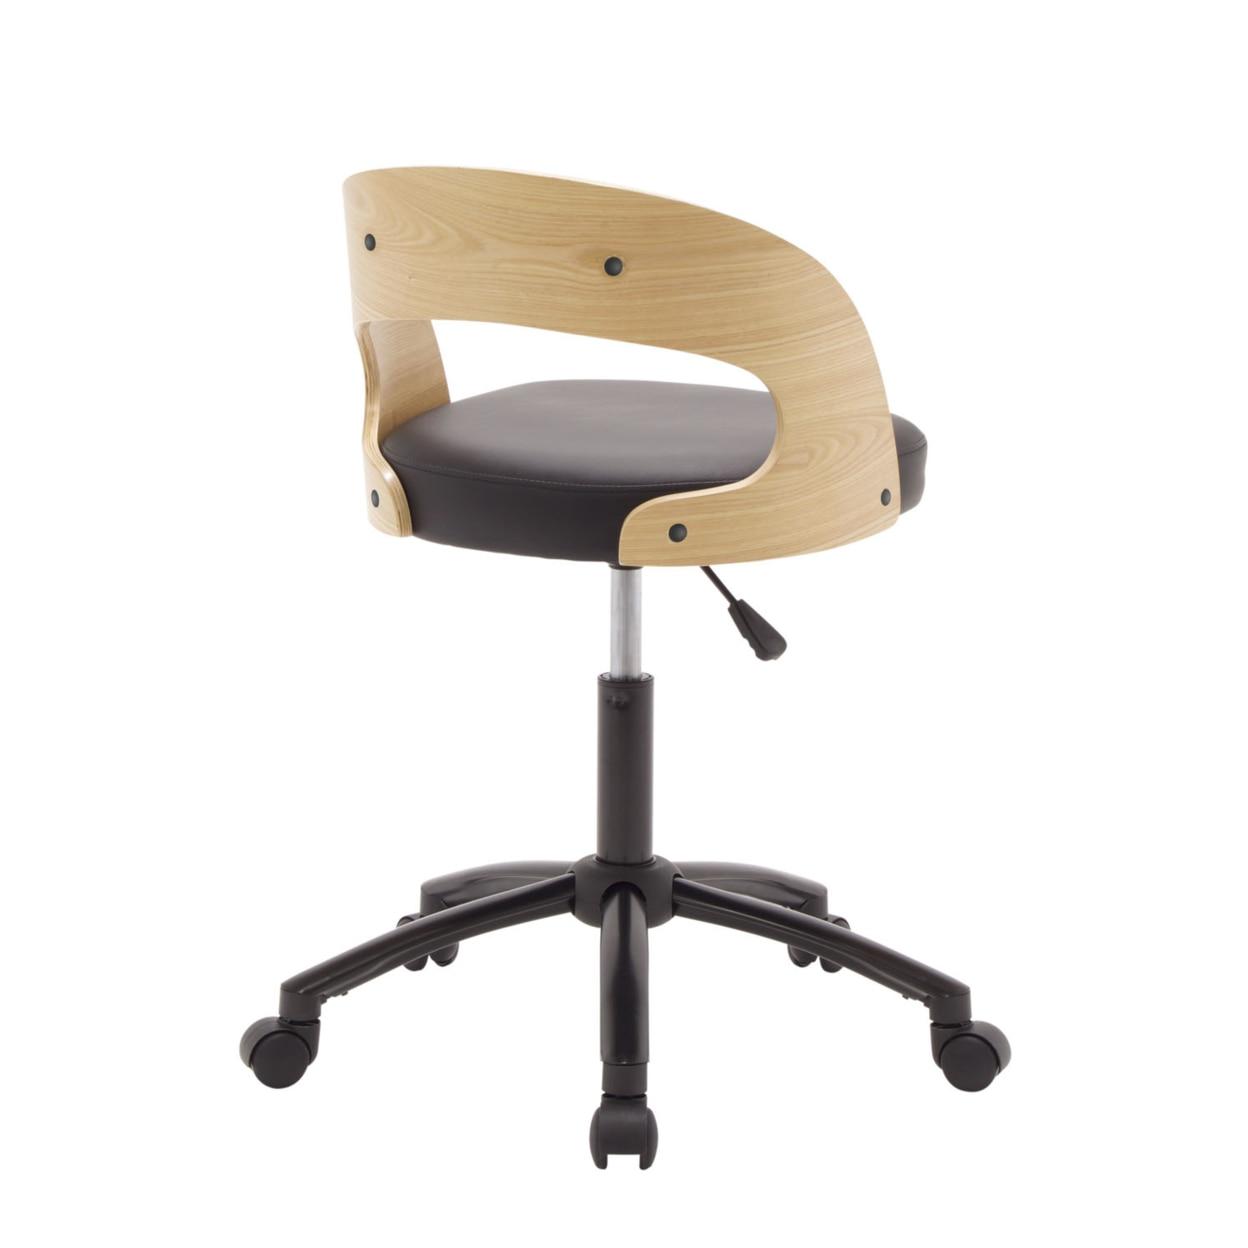 Offex Home Office Ashwood Chair - Black/Ashwood